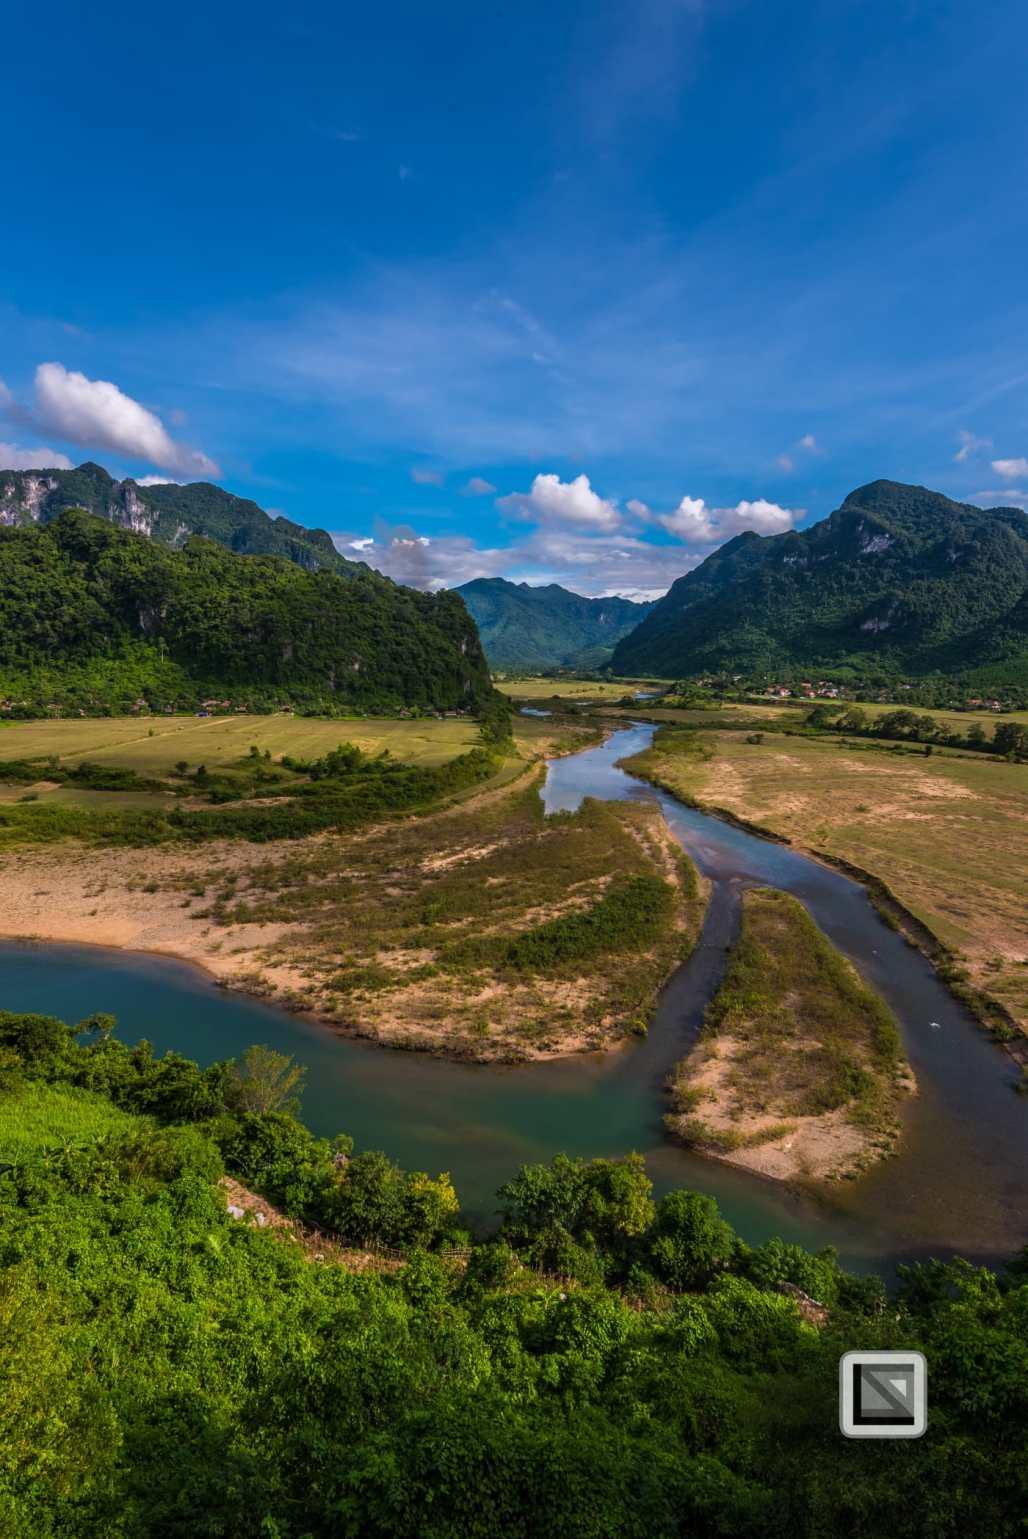 vietnam-hcm_trail-khe_sanh-to-phong_nha-902